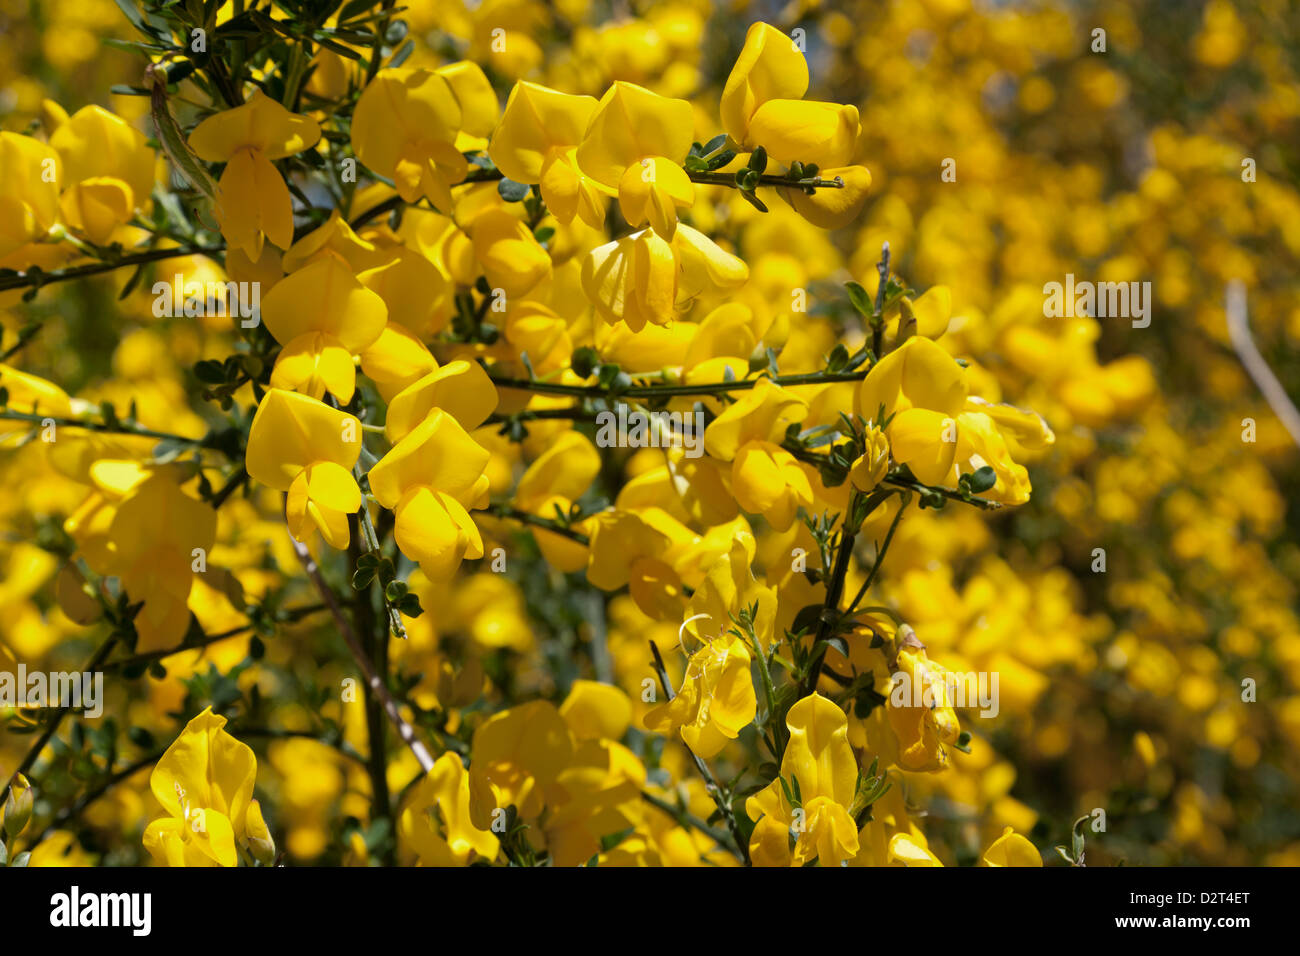 Yellow broom flowers close up stock photo 53390816 alamy yellow broom flowers close up mightylinksfo